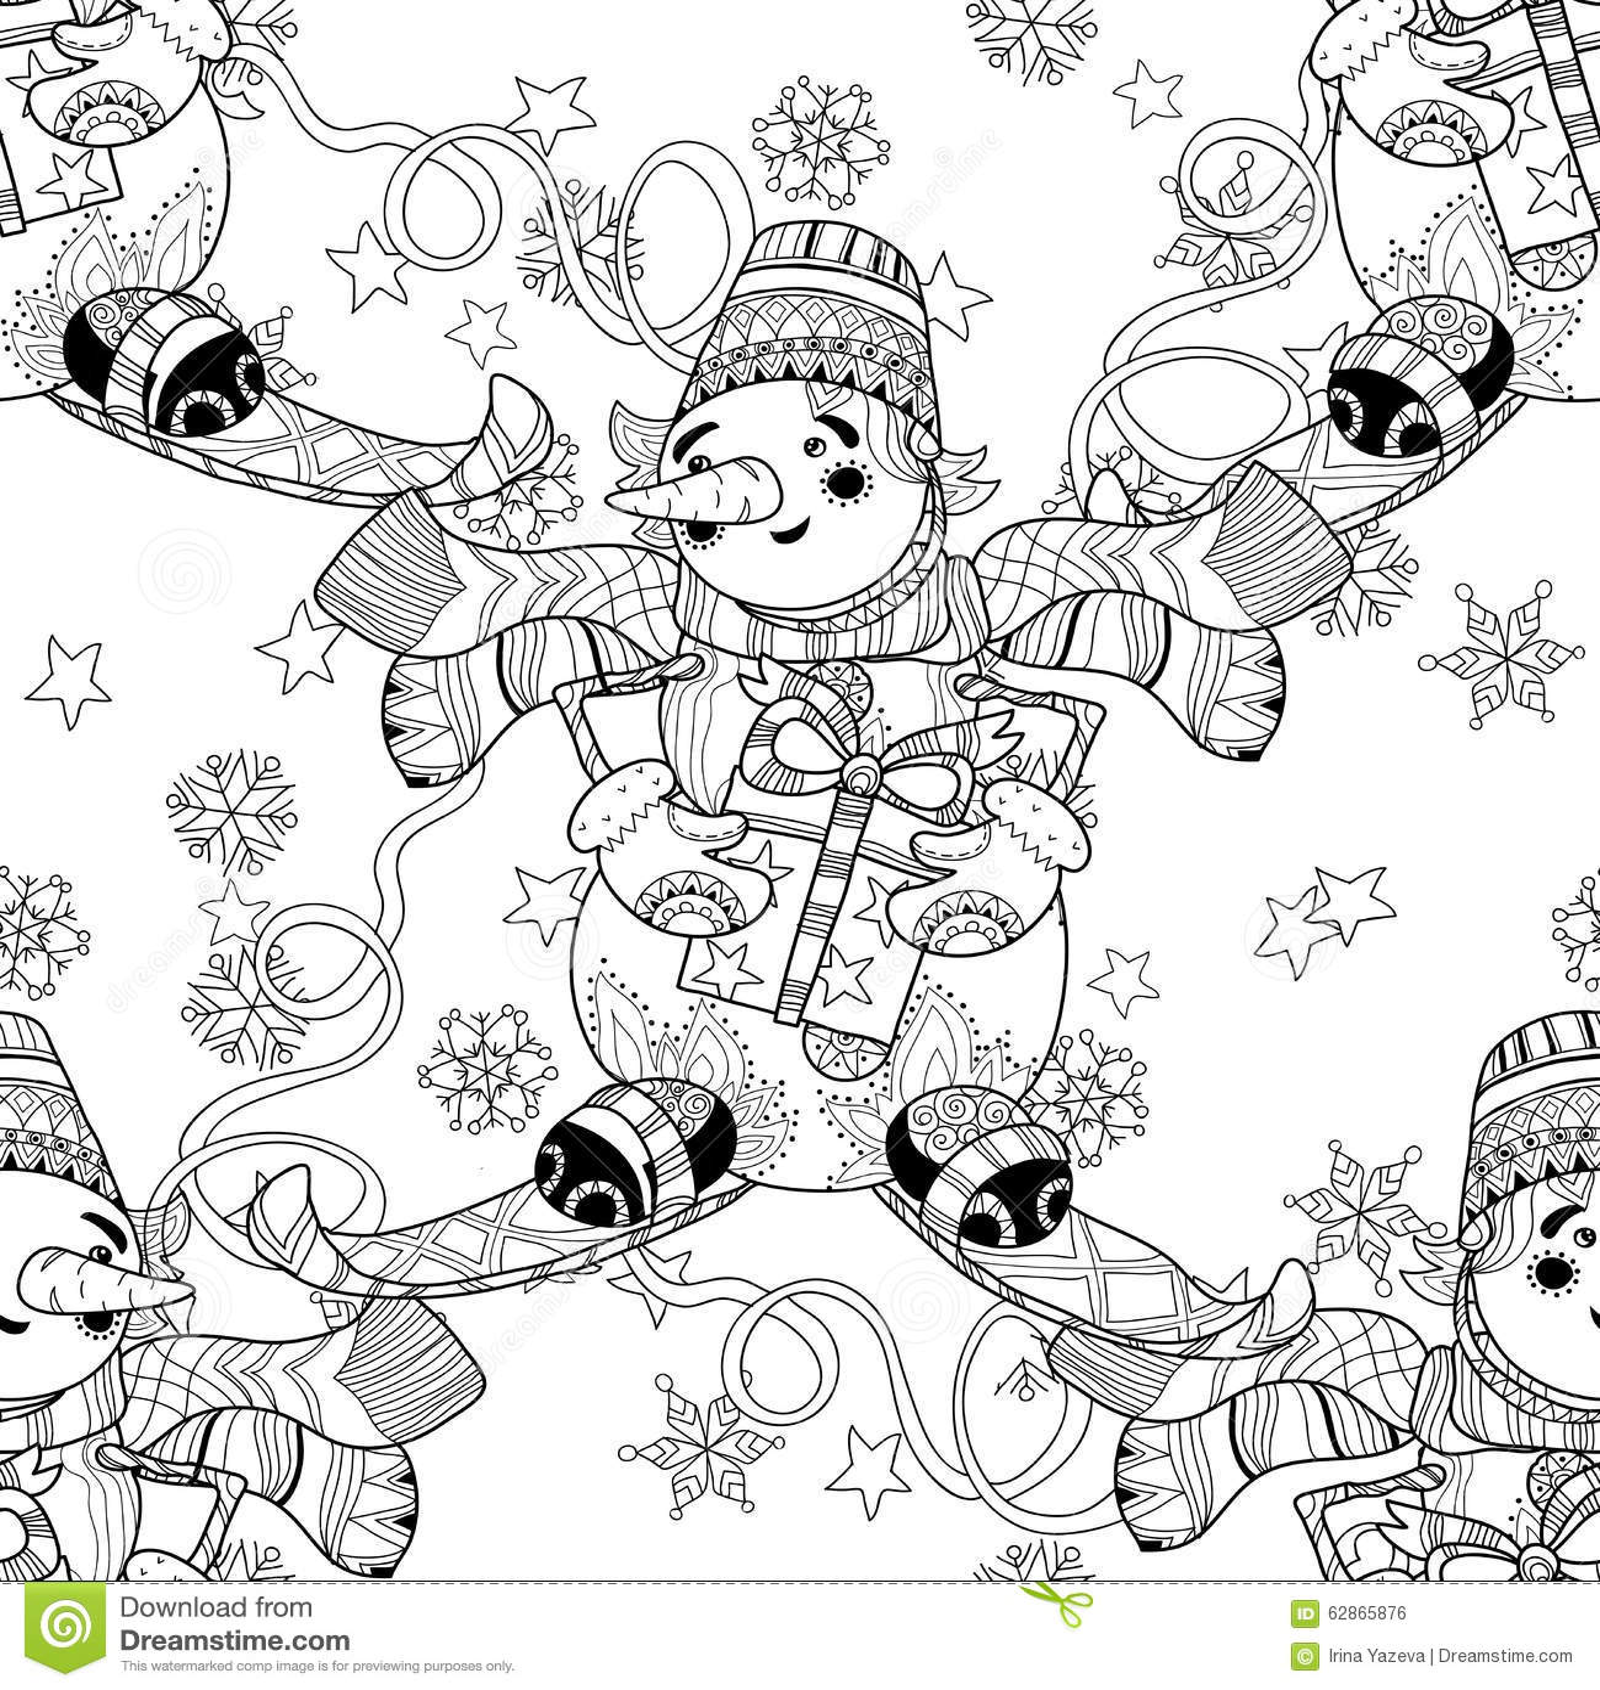 Zentangle Doodle Hand Drawn Christmas Snowman Ski Stock